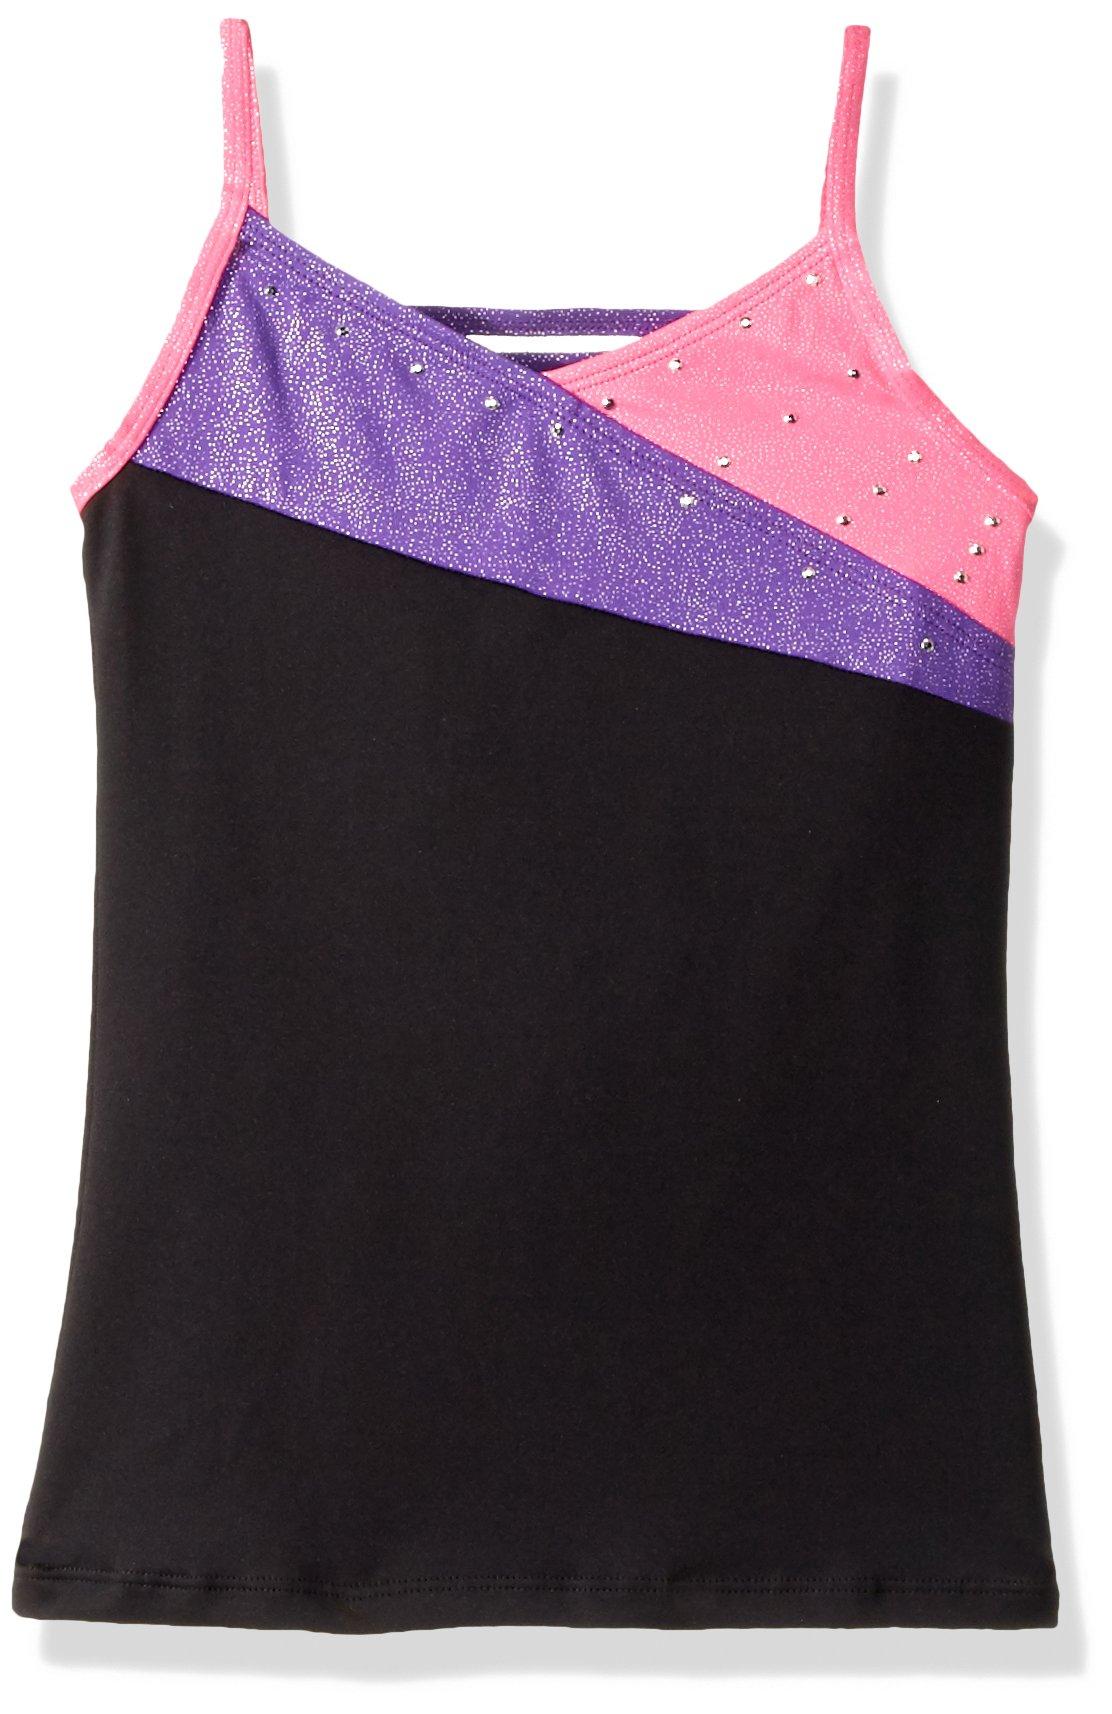 Jacques Moret Big Girls' Gymanstics Tank Top, Rainbow Triangles Pink and Black Colorblock, M